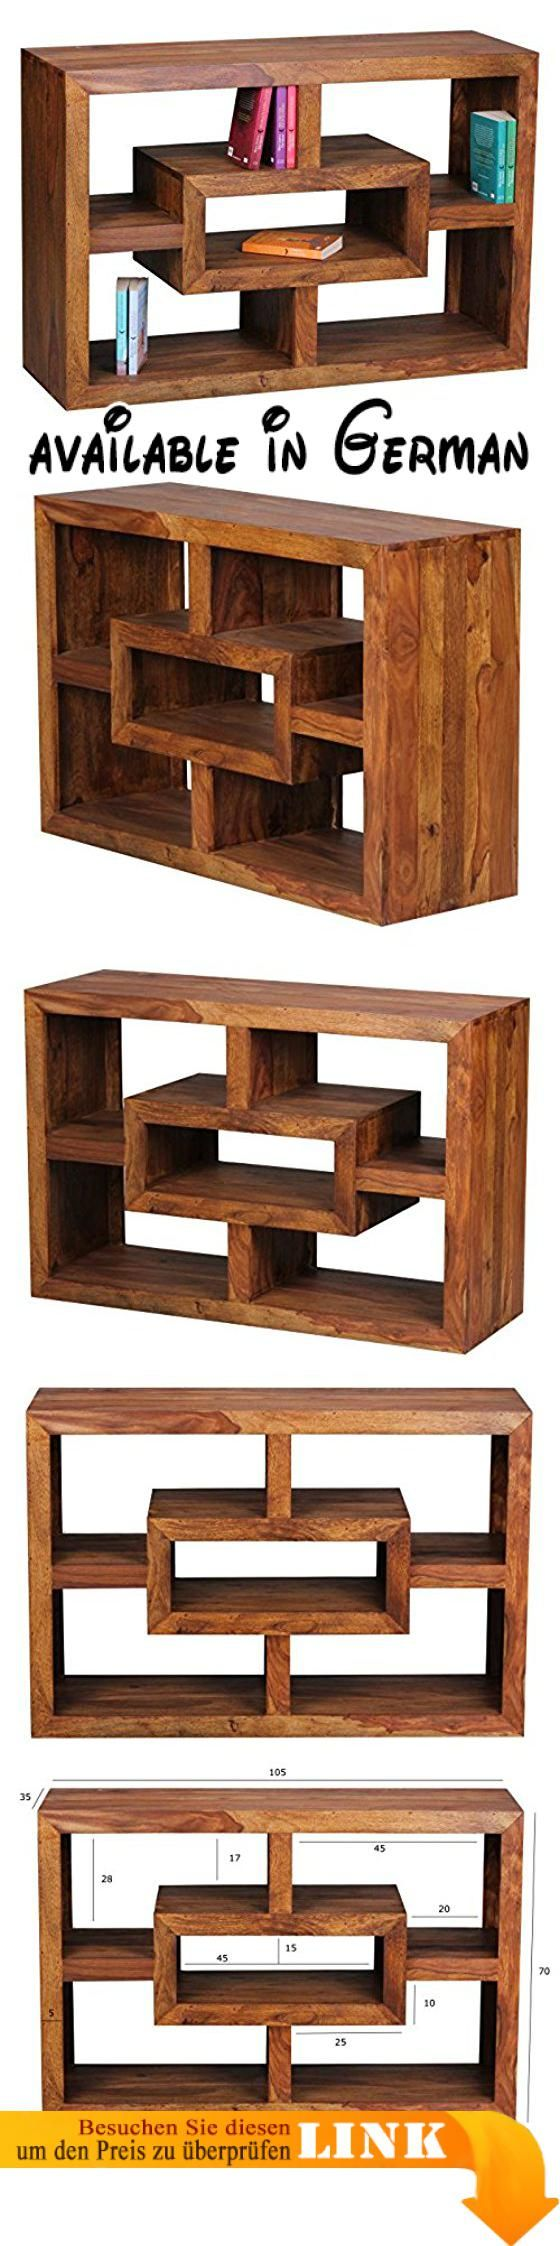 B00lcku9f8 Wohnling Bucherregal Massiv Holz Sheesham 105 X 70 Cm